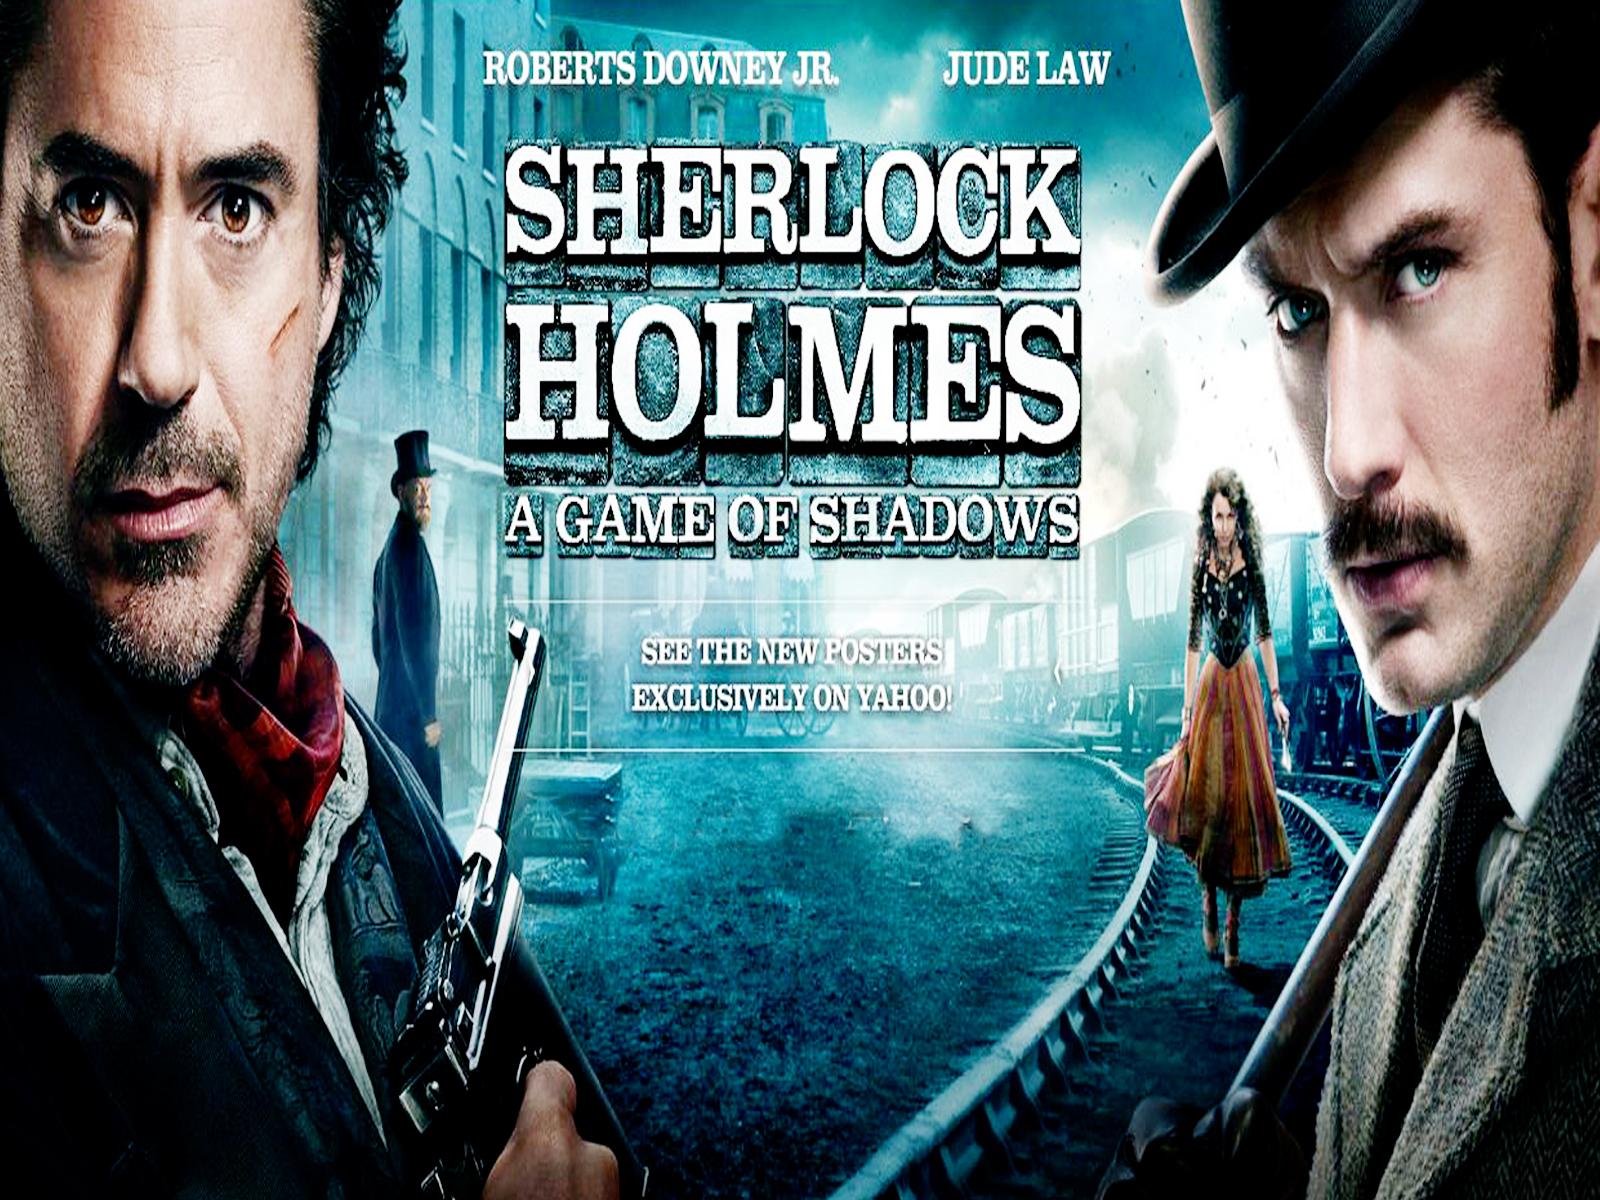 http://3.bp.blogspot.com/-rDWAUN_wMJ8/TtLoVnKvBNI/AAAAAAAAAHs/2WJsgJHtC9U/s1600/Sherlock_Holmes_A_Game_of_Shadows_Vvallpaper.Net.jpg